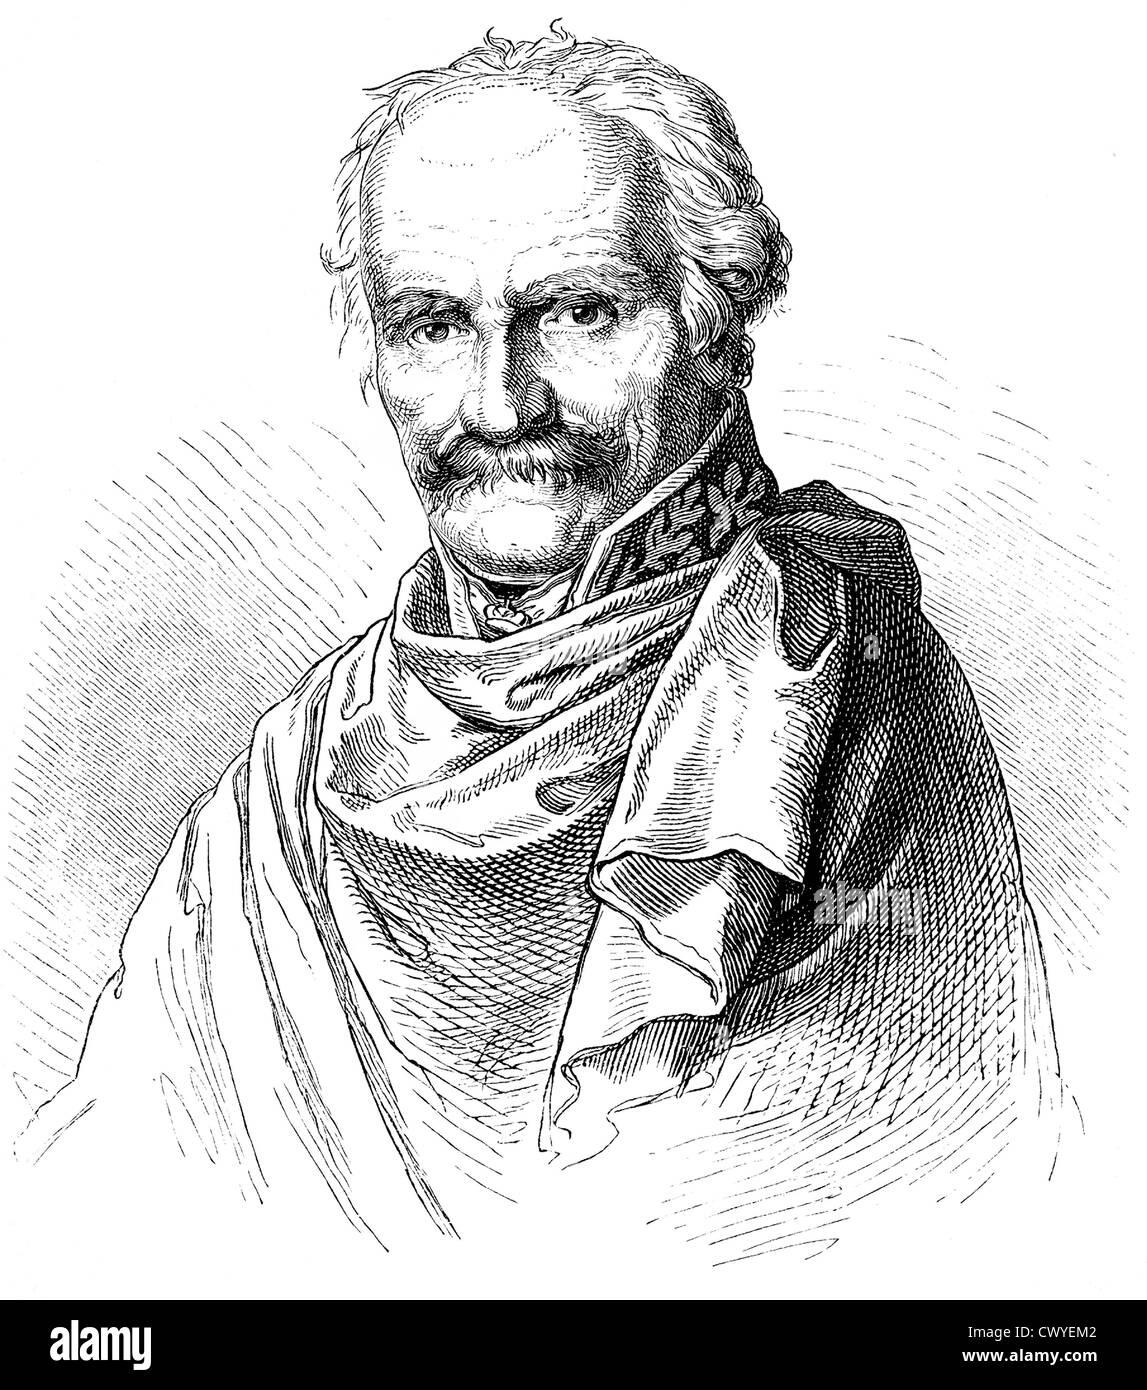 Gebhard Leberecht von Bluecher, Prince of Wahlstatt or Marshal Forward, 1742 - 1819, a Prussian Field Marshal, Stock Photo